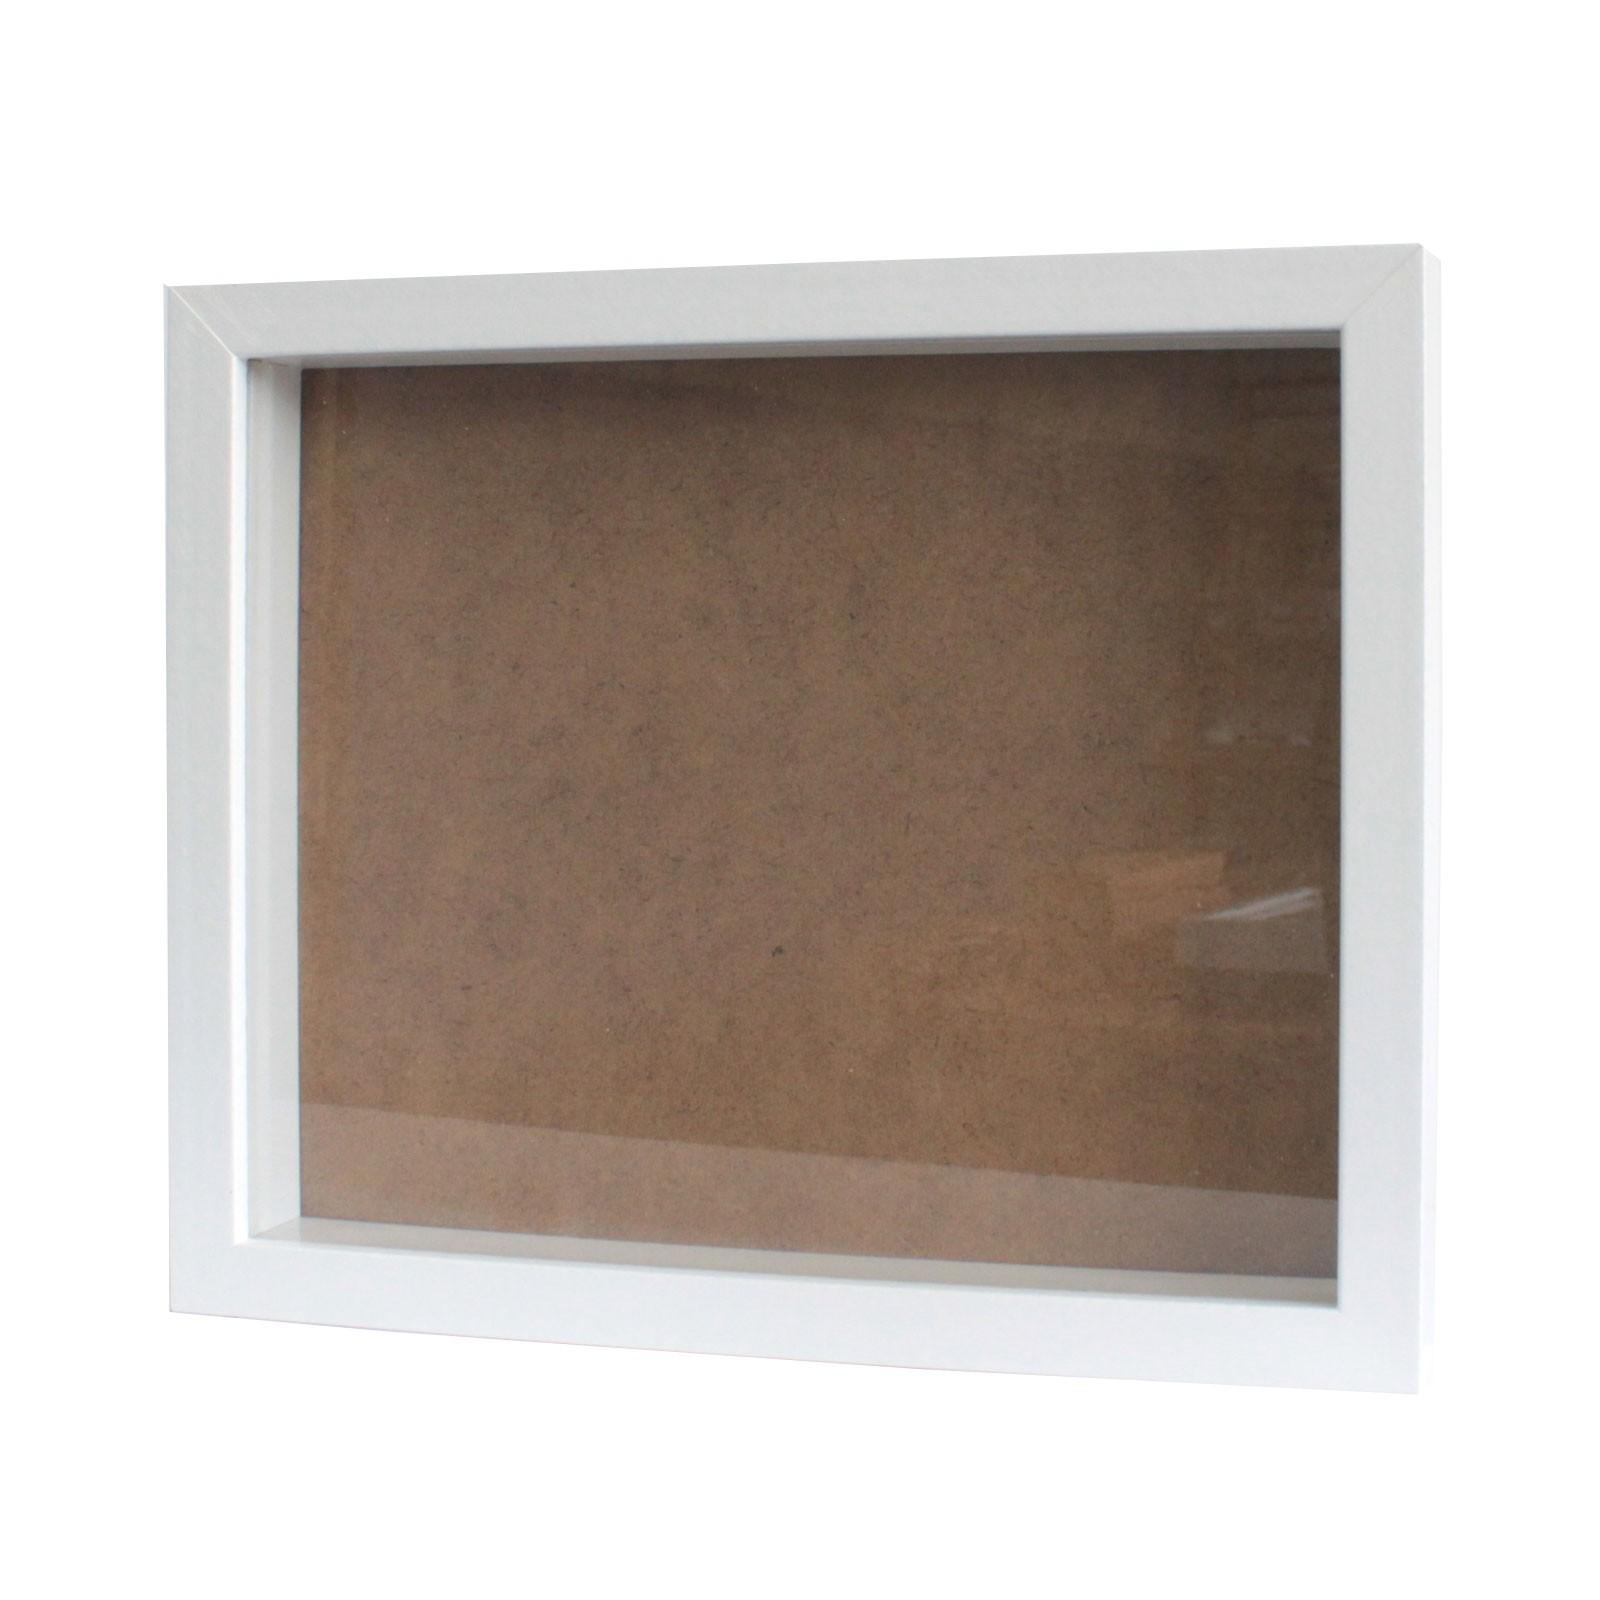 Deep Box Frame Large Portrait 25x30cm White